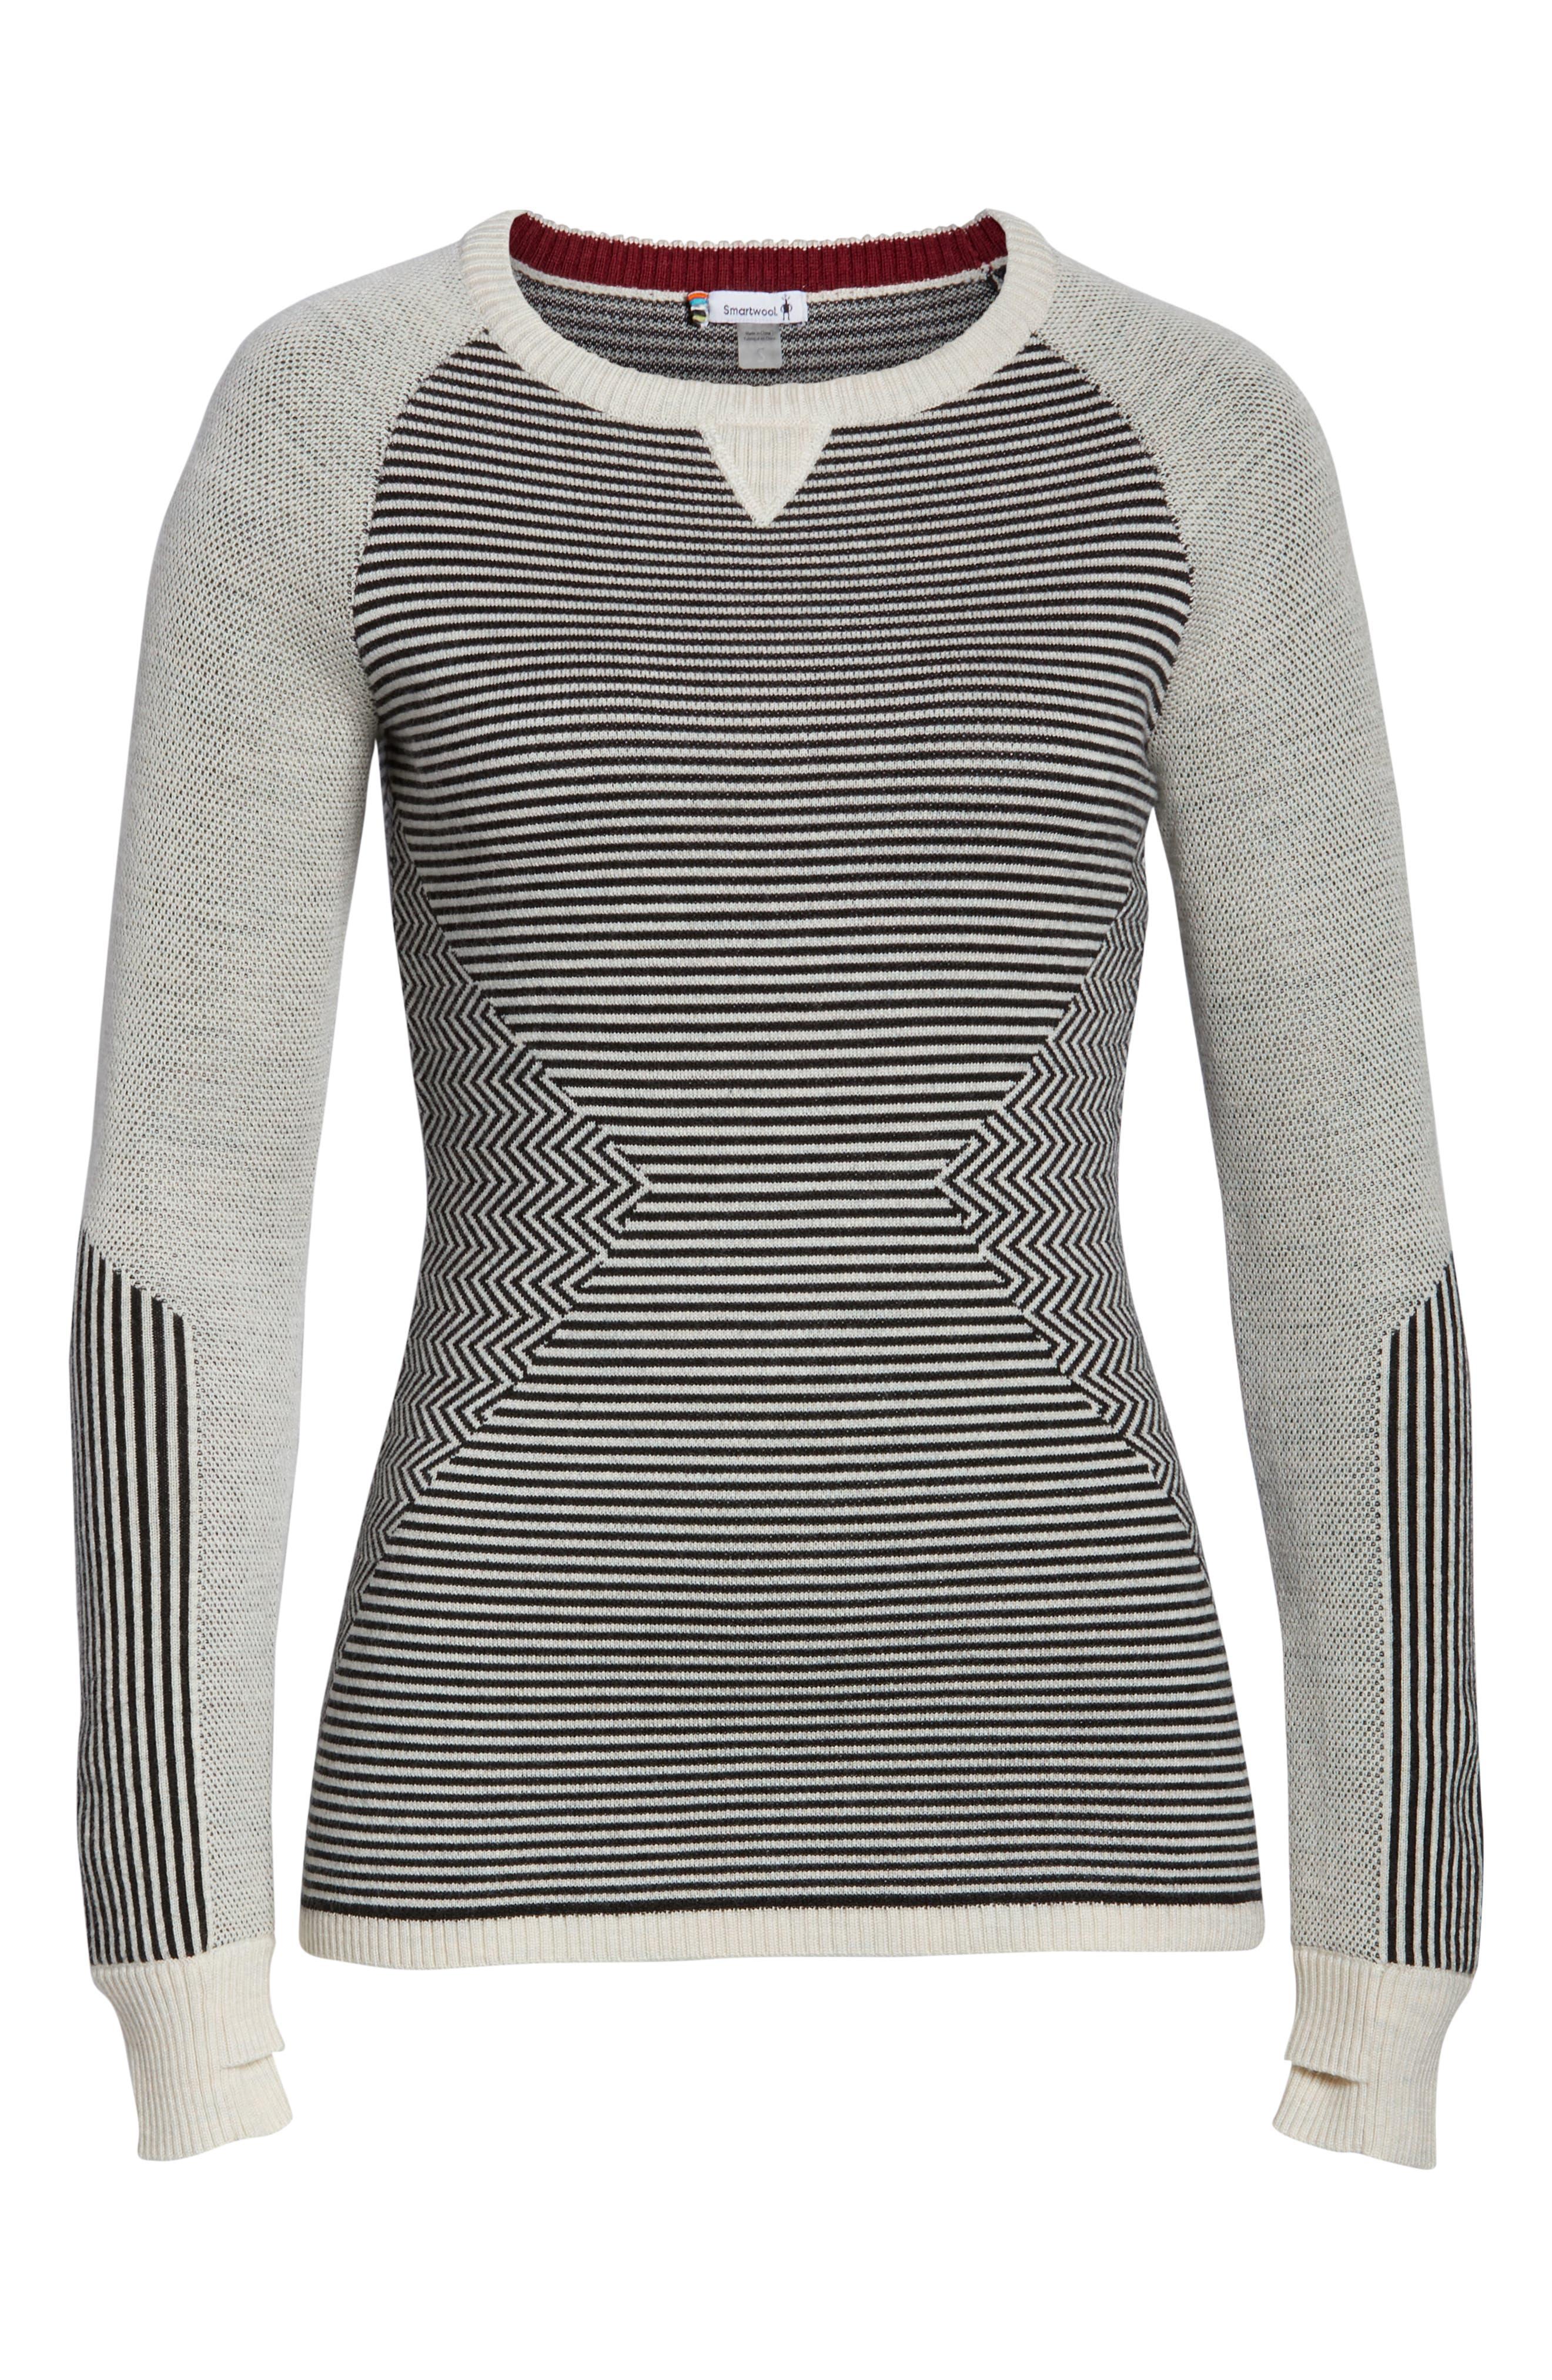 Dacono Ski Sweater,                             Alternate thumbnail 7, color,                             001